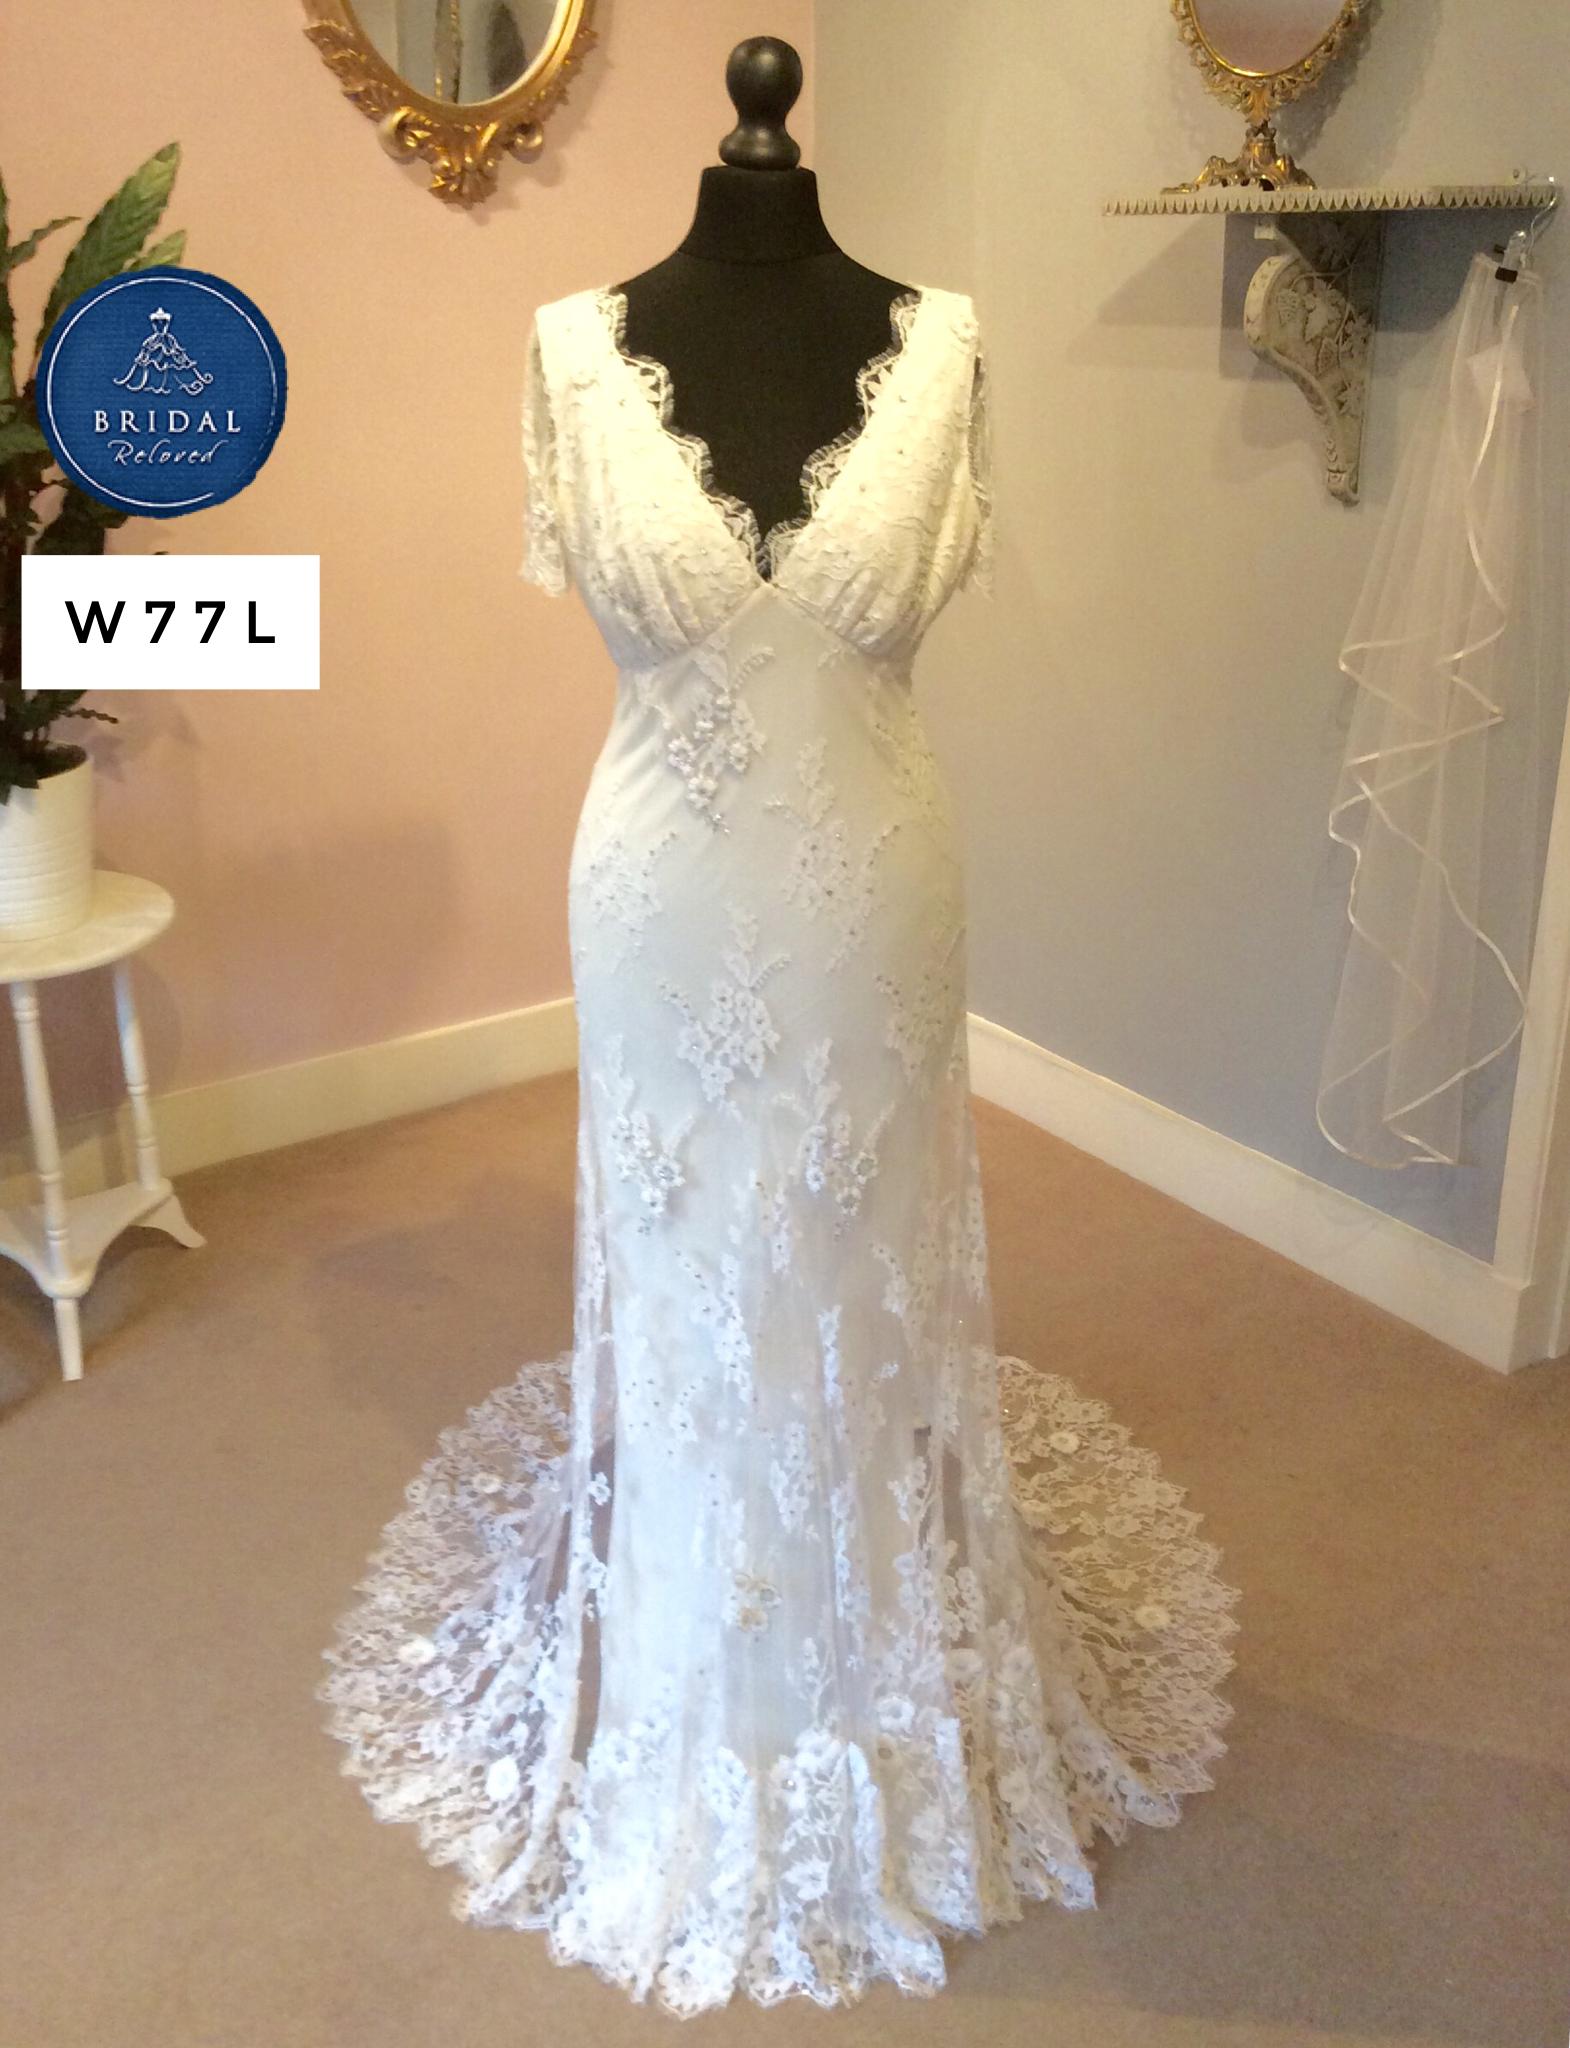 3ff3c7fa945b5 Lace Weddings, Brides, The Bride, Bridal, Lace Wedding Dress